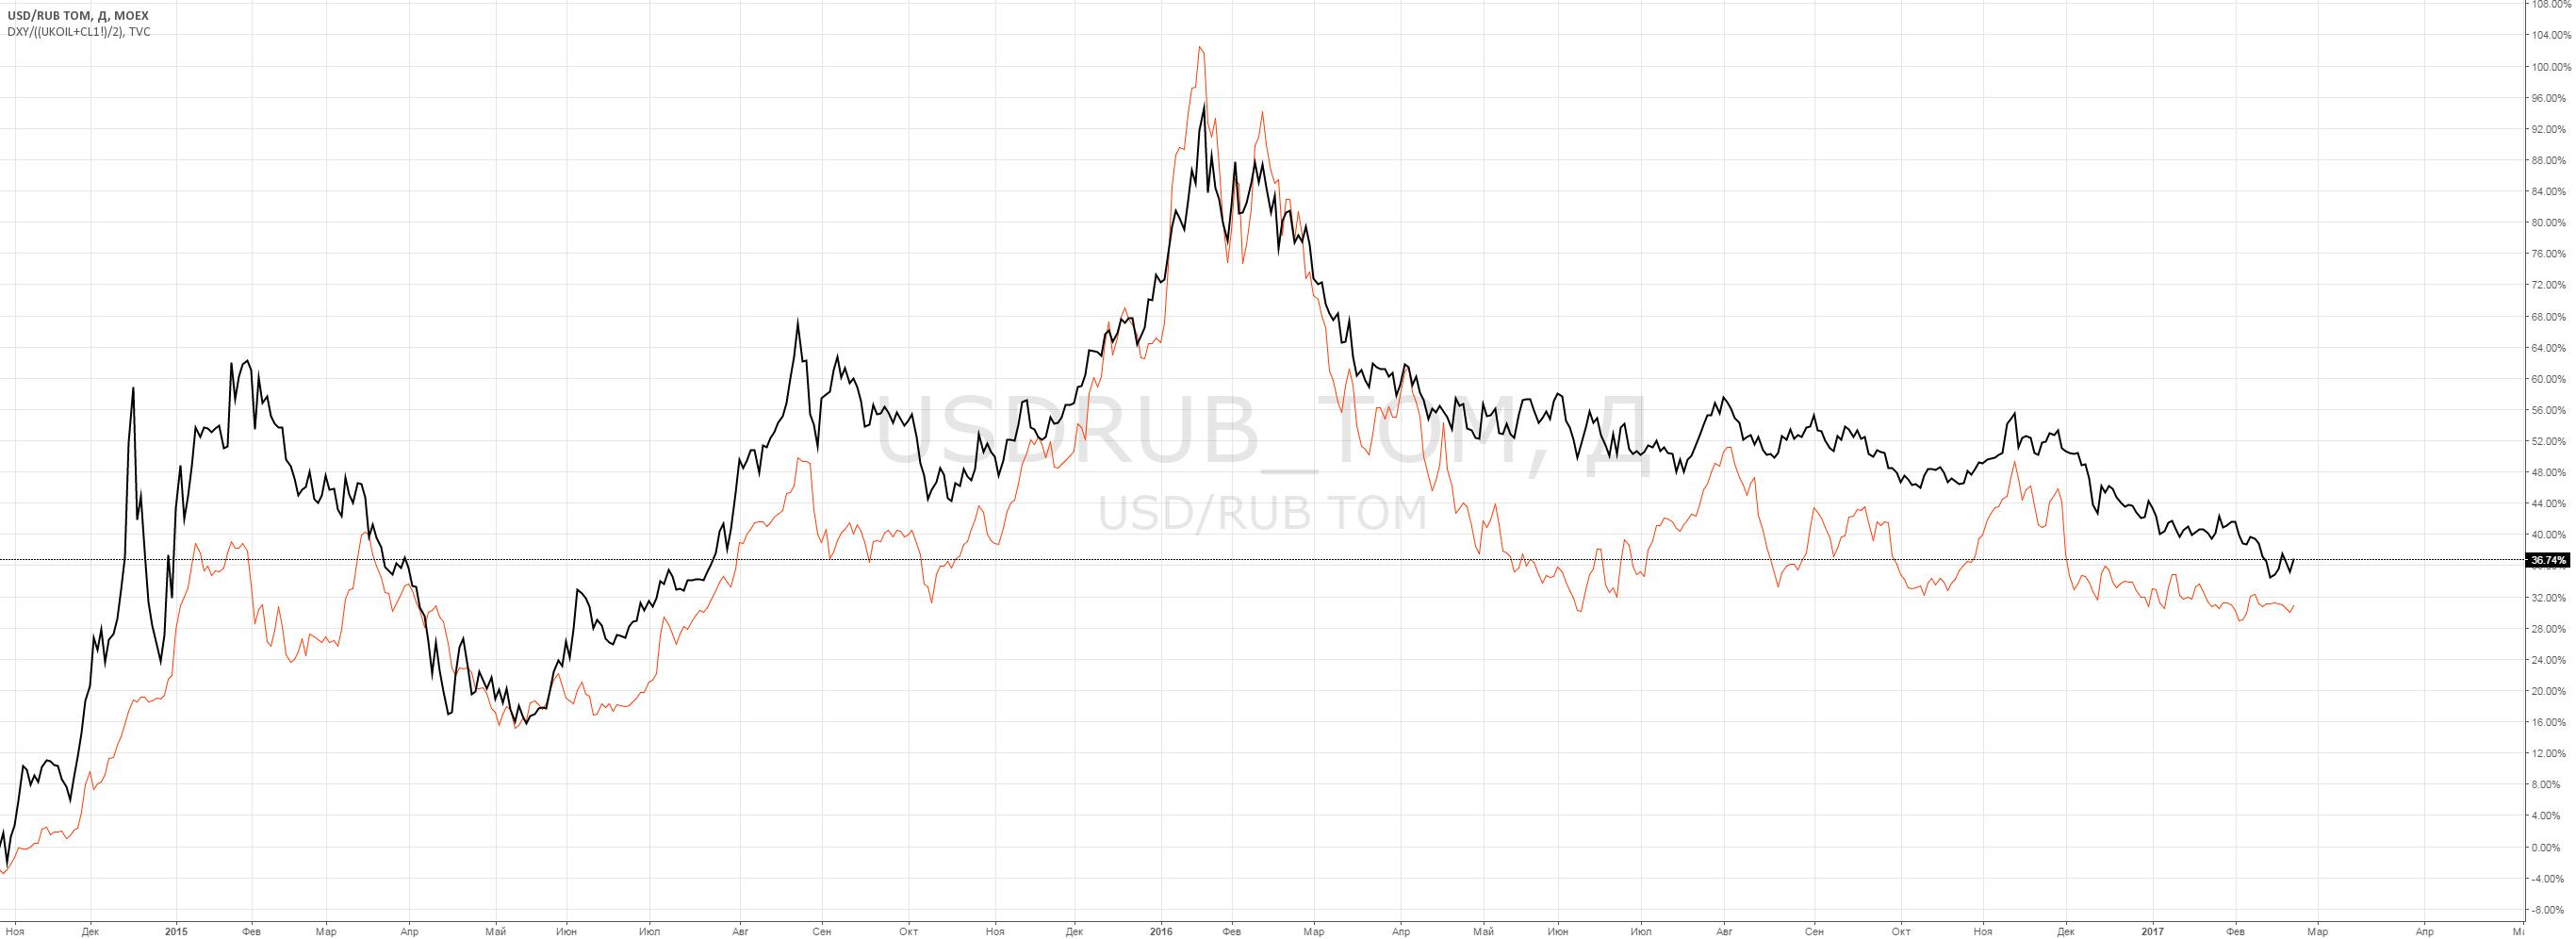 USDRUB_tom в сравнении с DXY/((UKOIL+CL1!)/2)